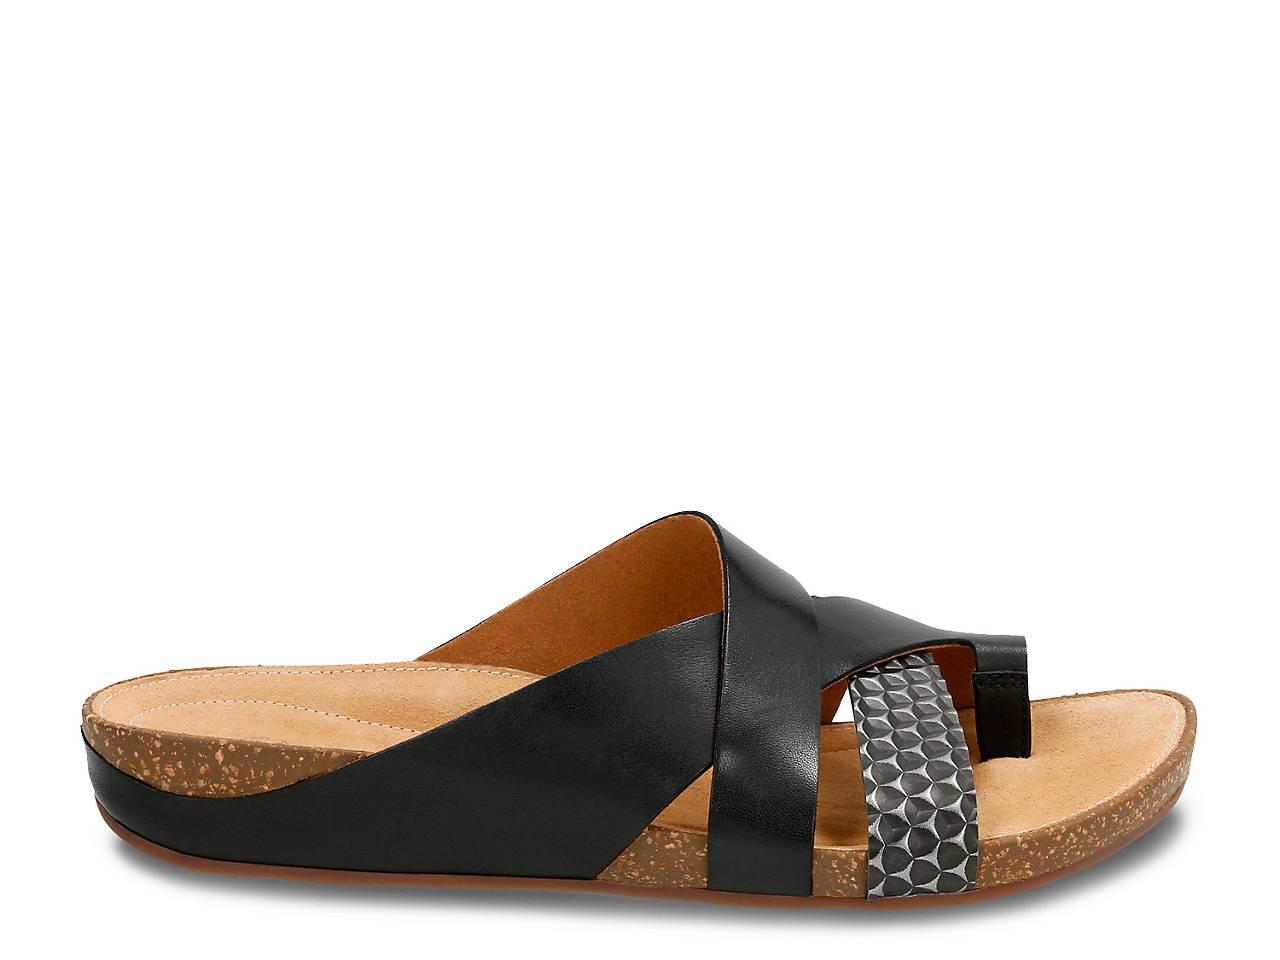 0c872c6fdc8e Clarks Perri Bay Slide Sandal Women s Shoes